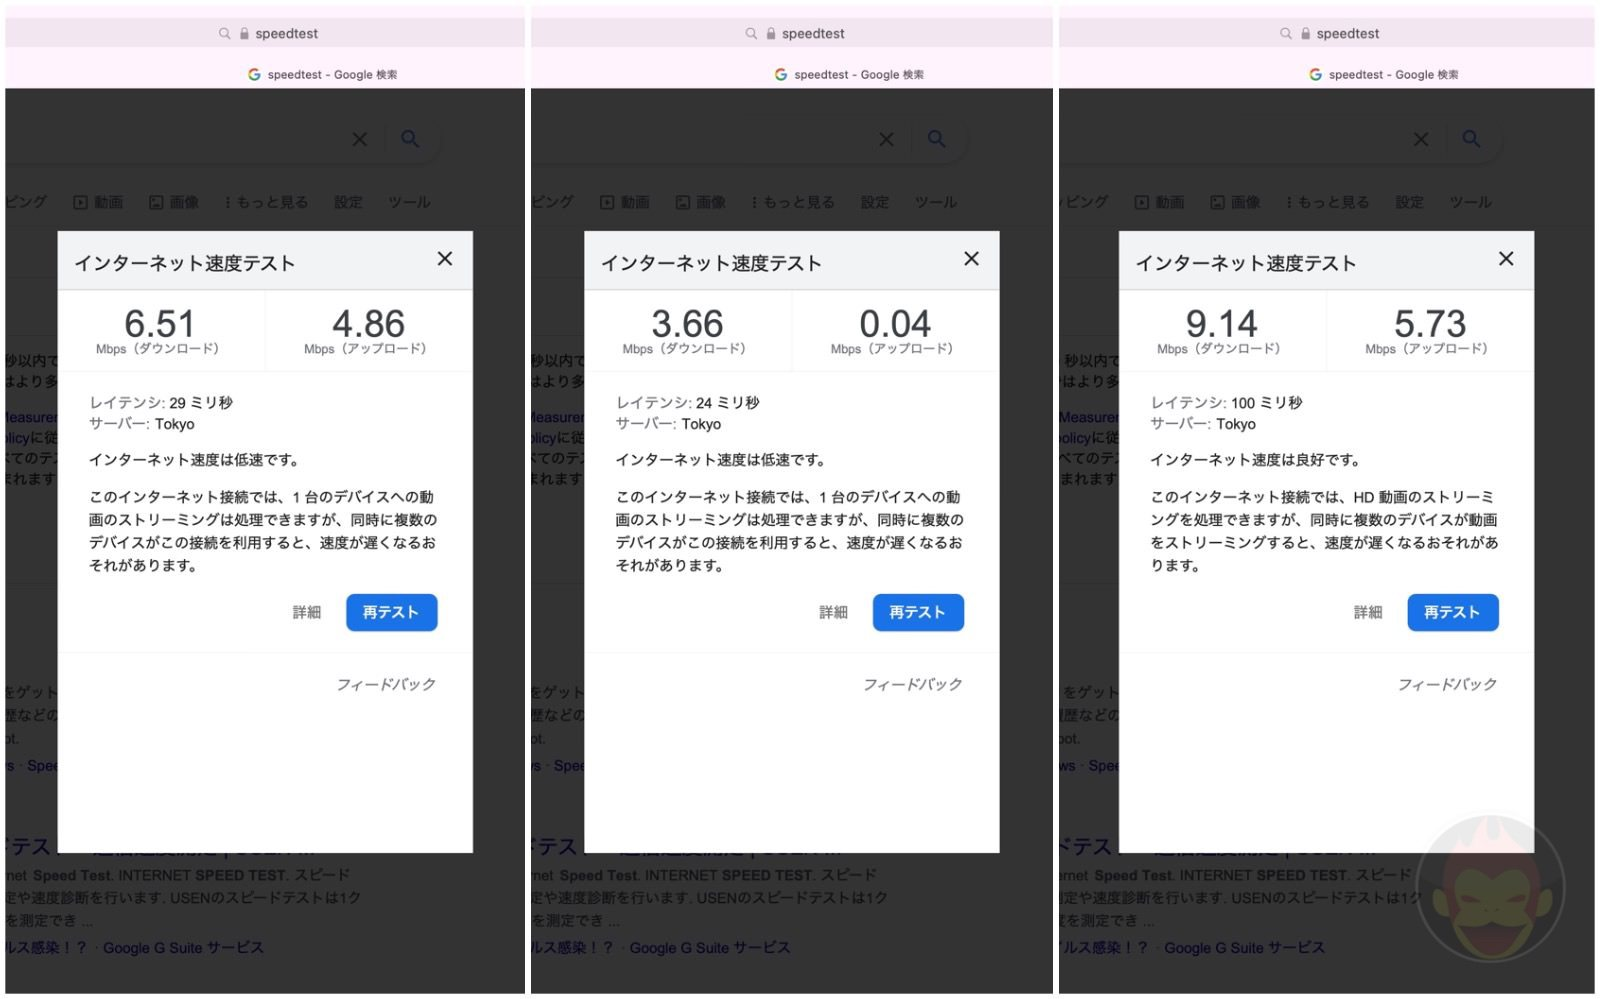 iphone12pro-tethering-inthepocket-.jpg